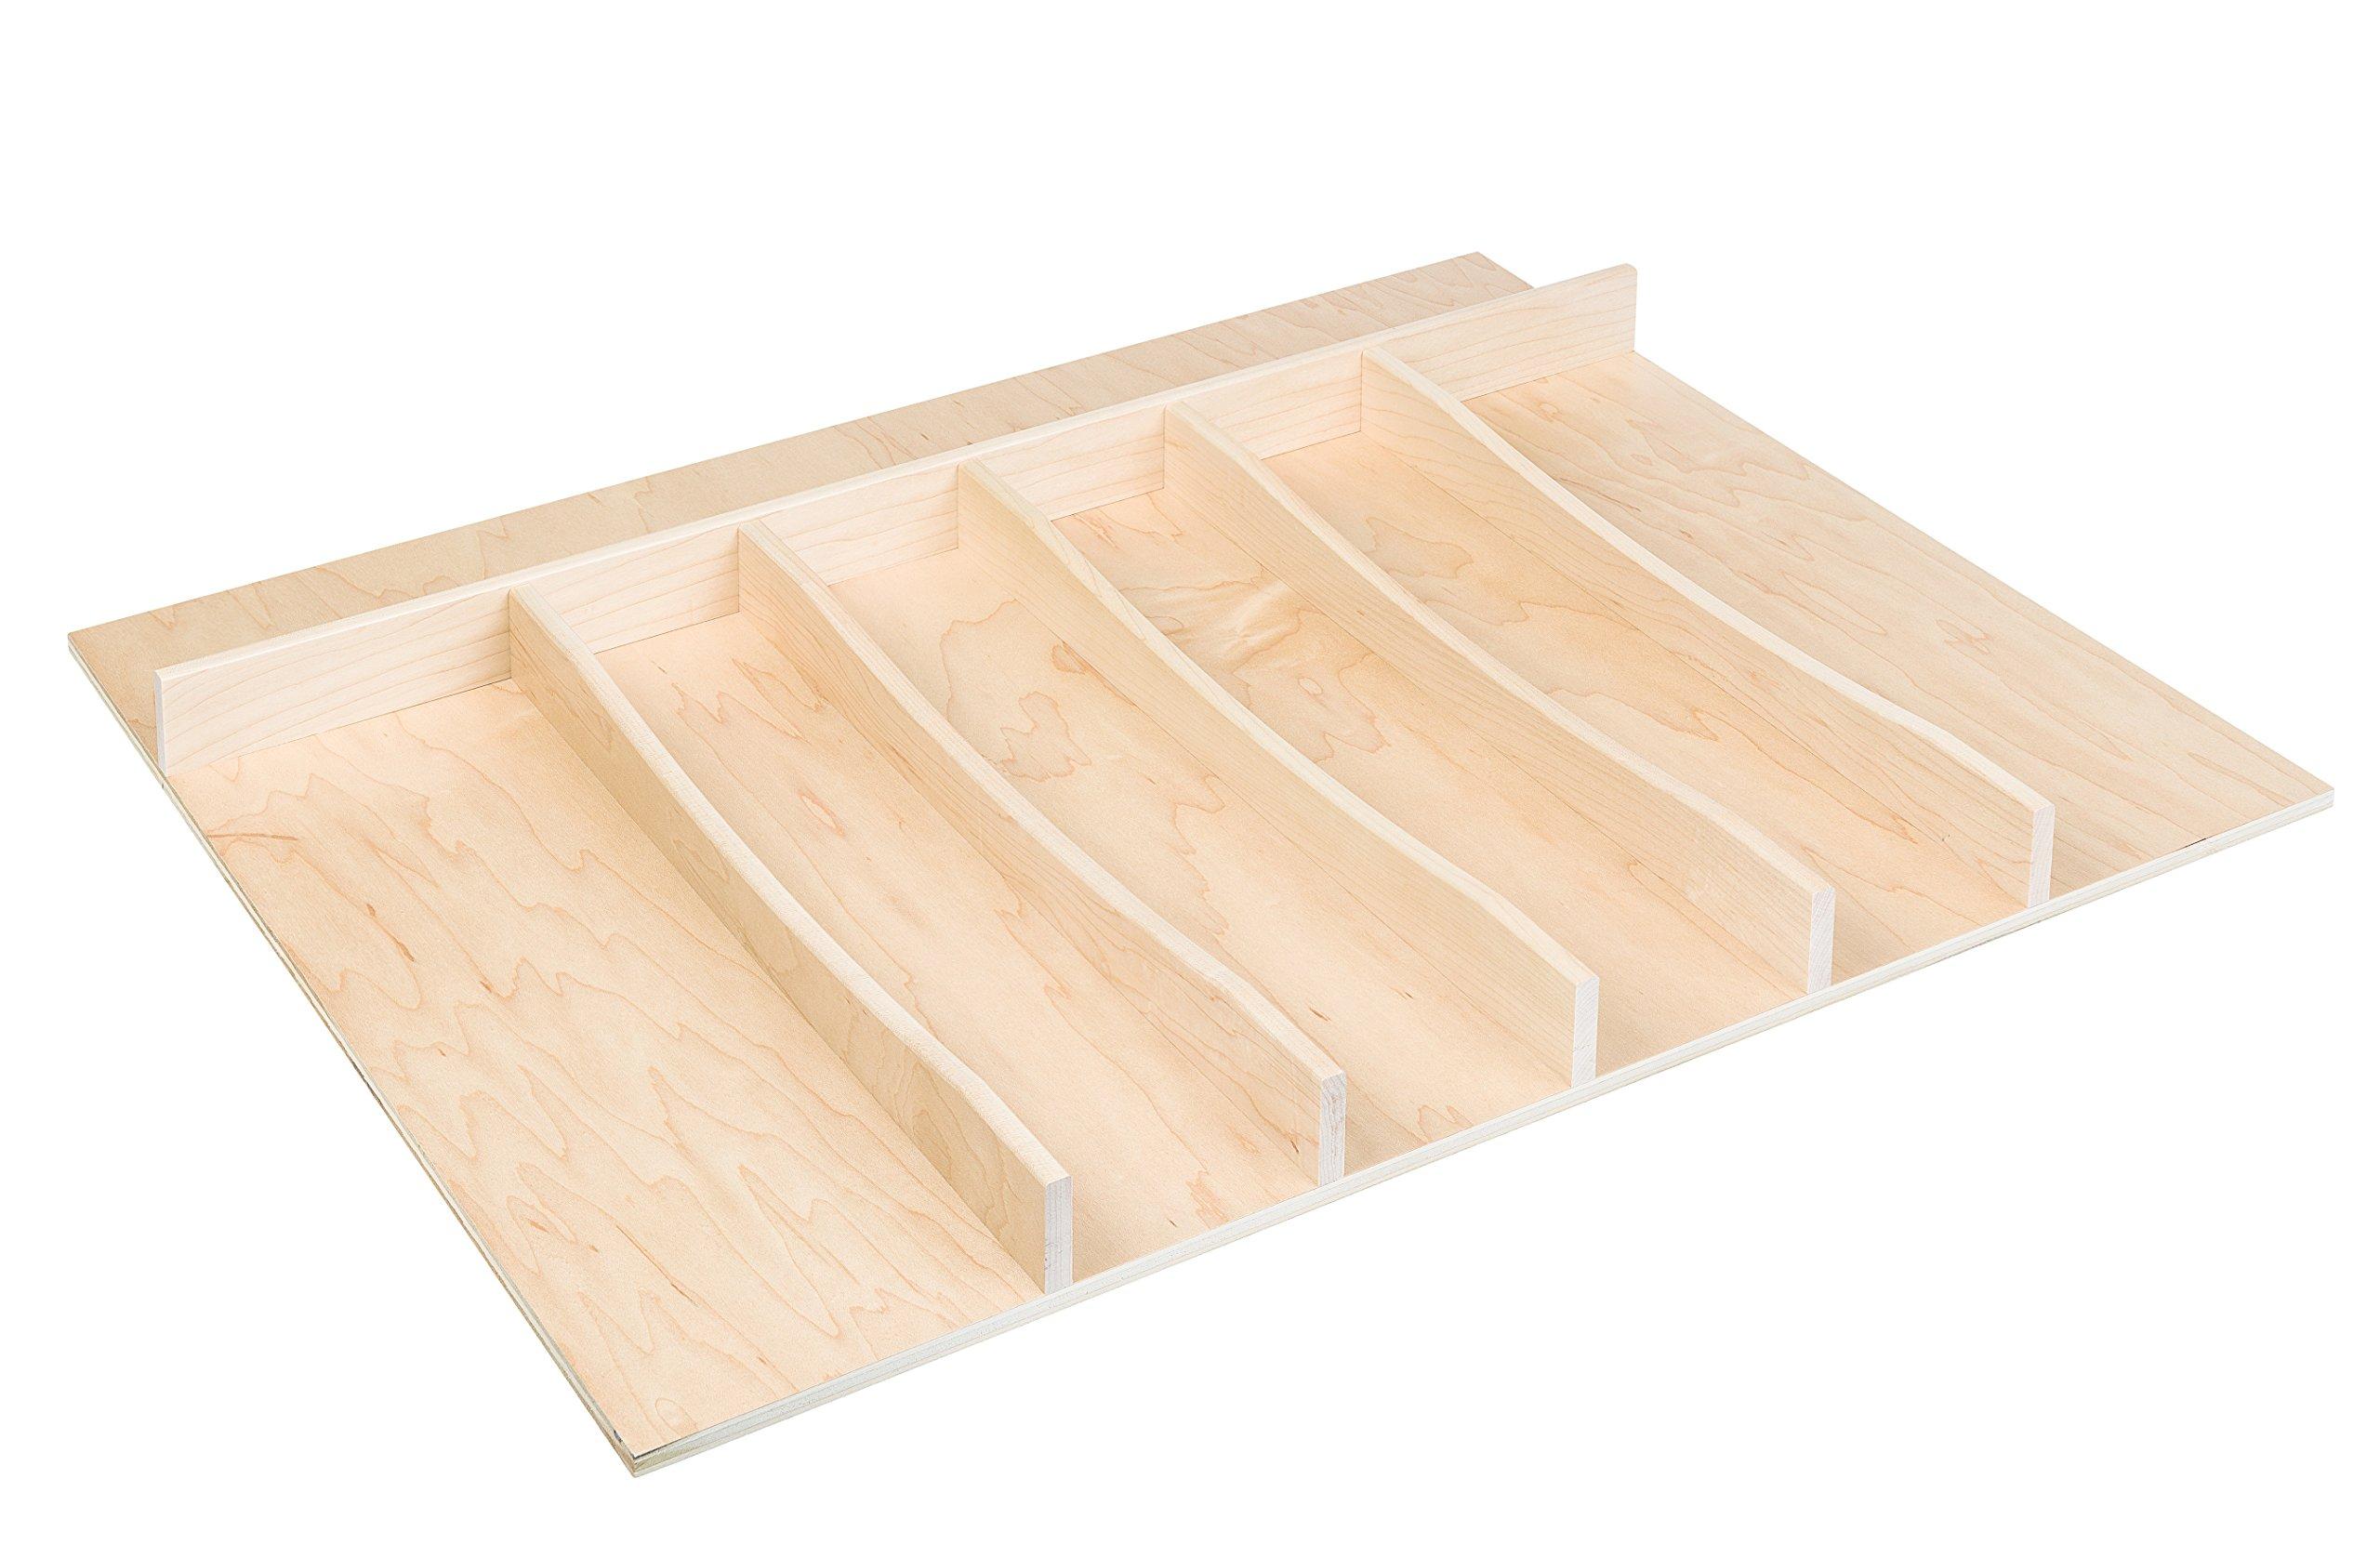 Century Components TTUT26PF Maple Wood Utensil Tray Kitchen Drawer Insert Organizer Trimmable 26-3/4'' x 22''